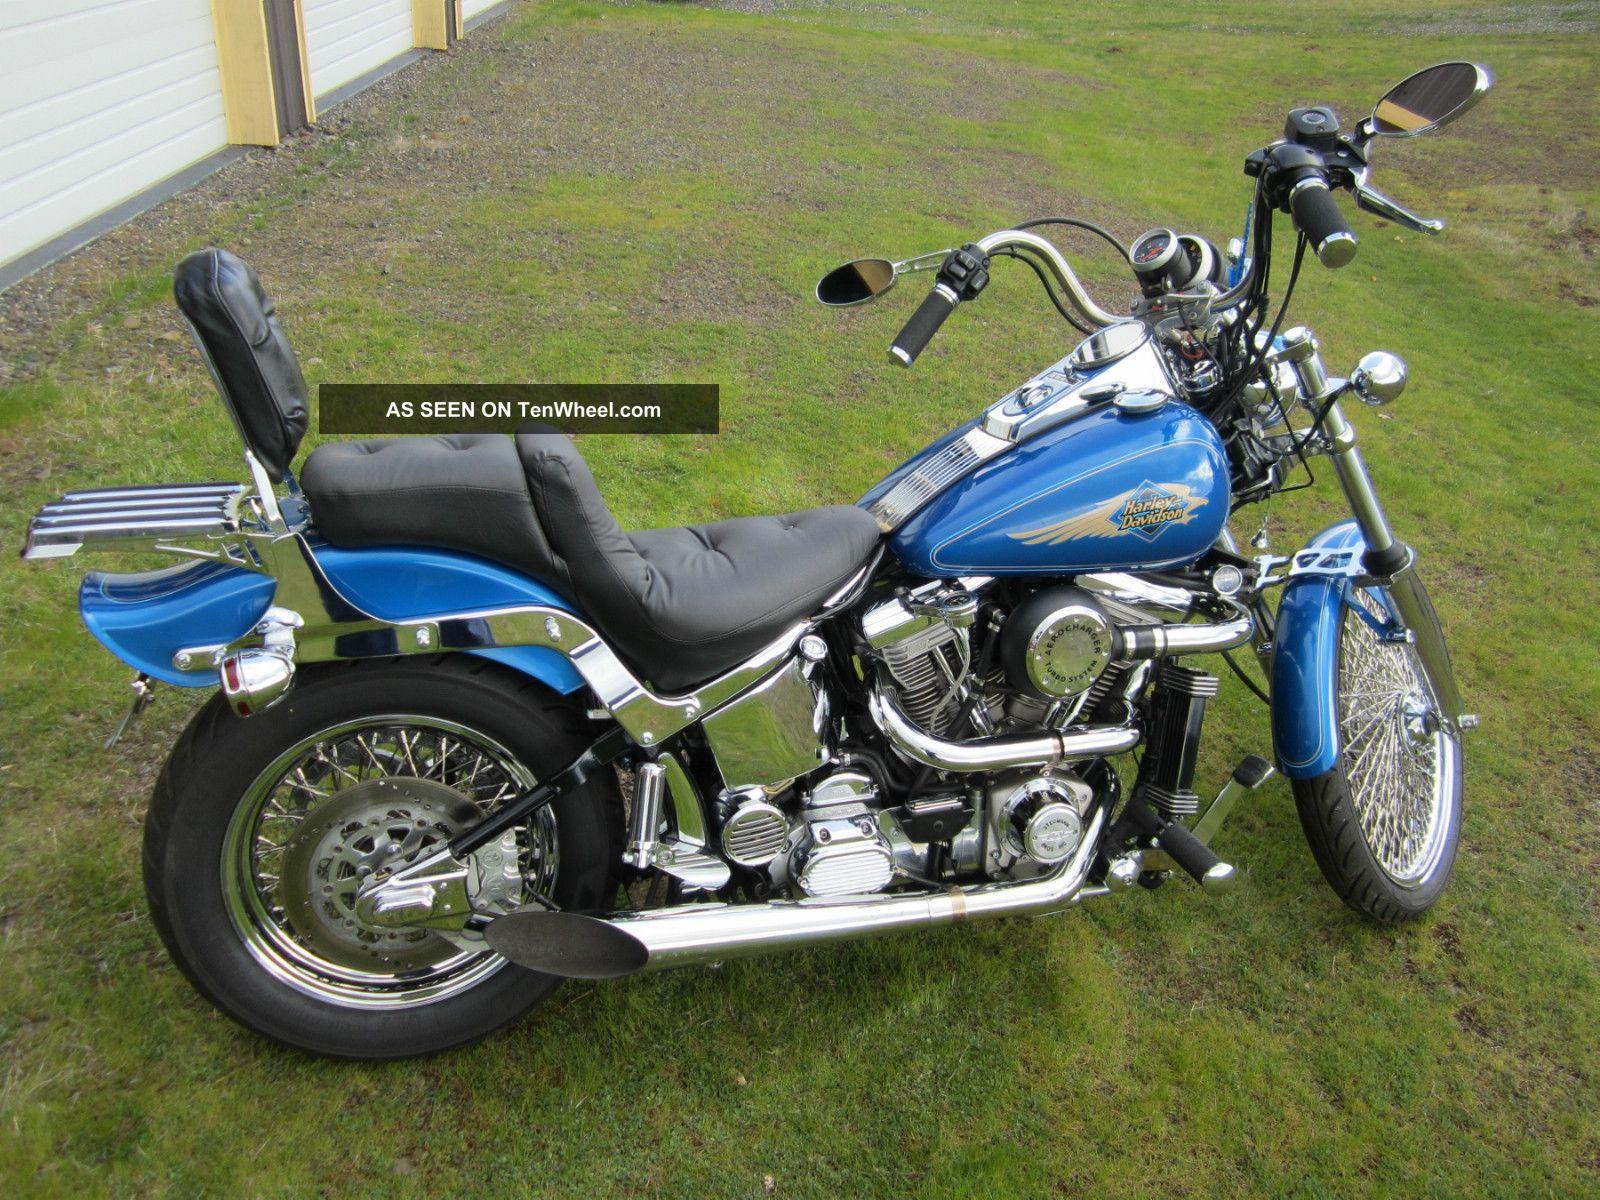 1996 Harley Davidson Softail Custom (fxstc) Softail photo